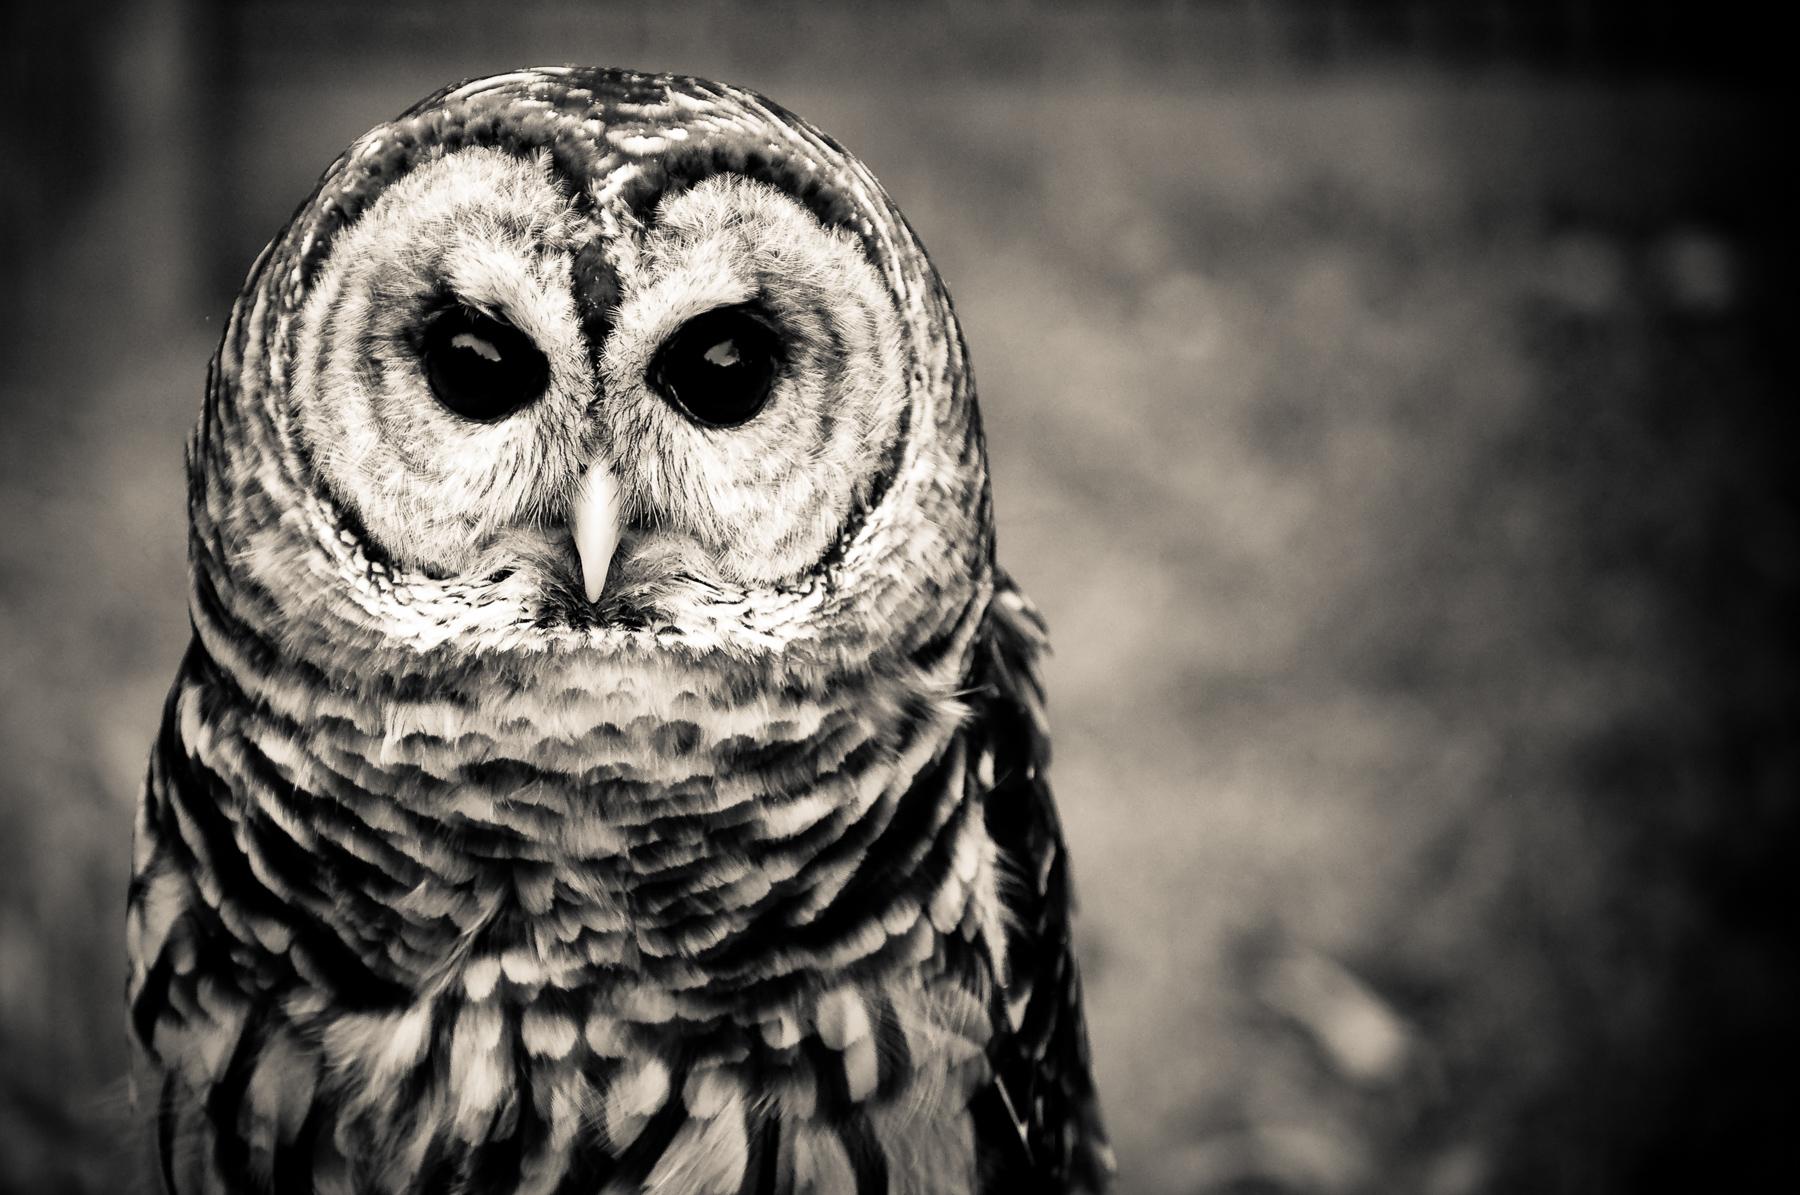 nature-wildlife-bird-owl.jpg